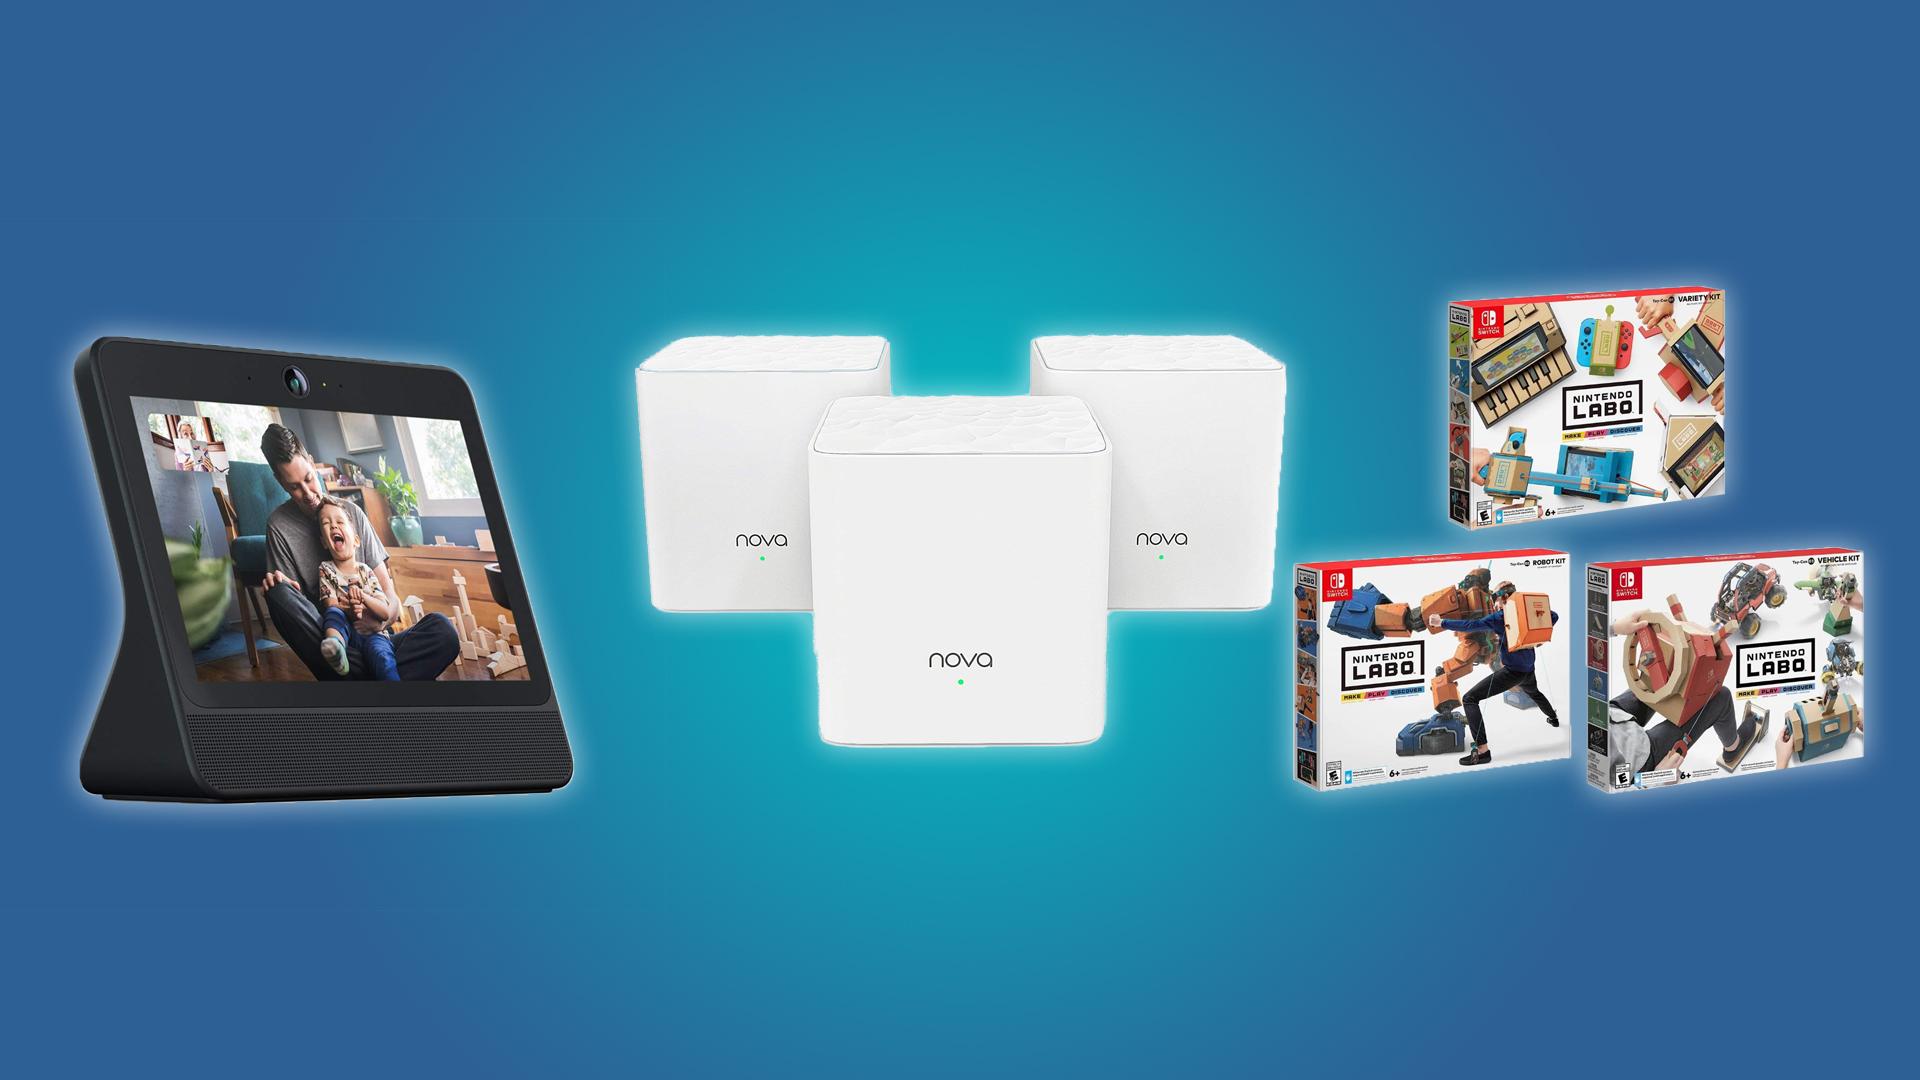 The Facebook Porta, Tenda Nova Mesh Wi-Fi System, and the Nintendo Labo Kit